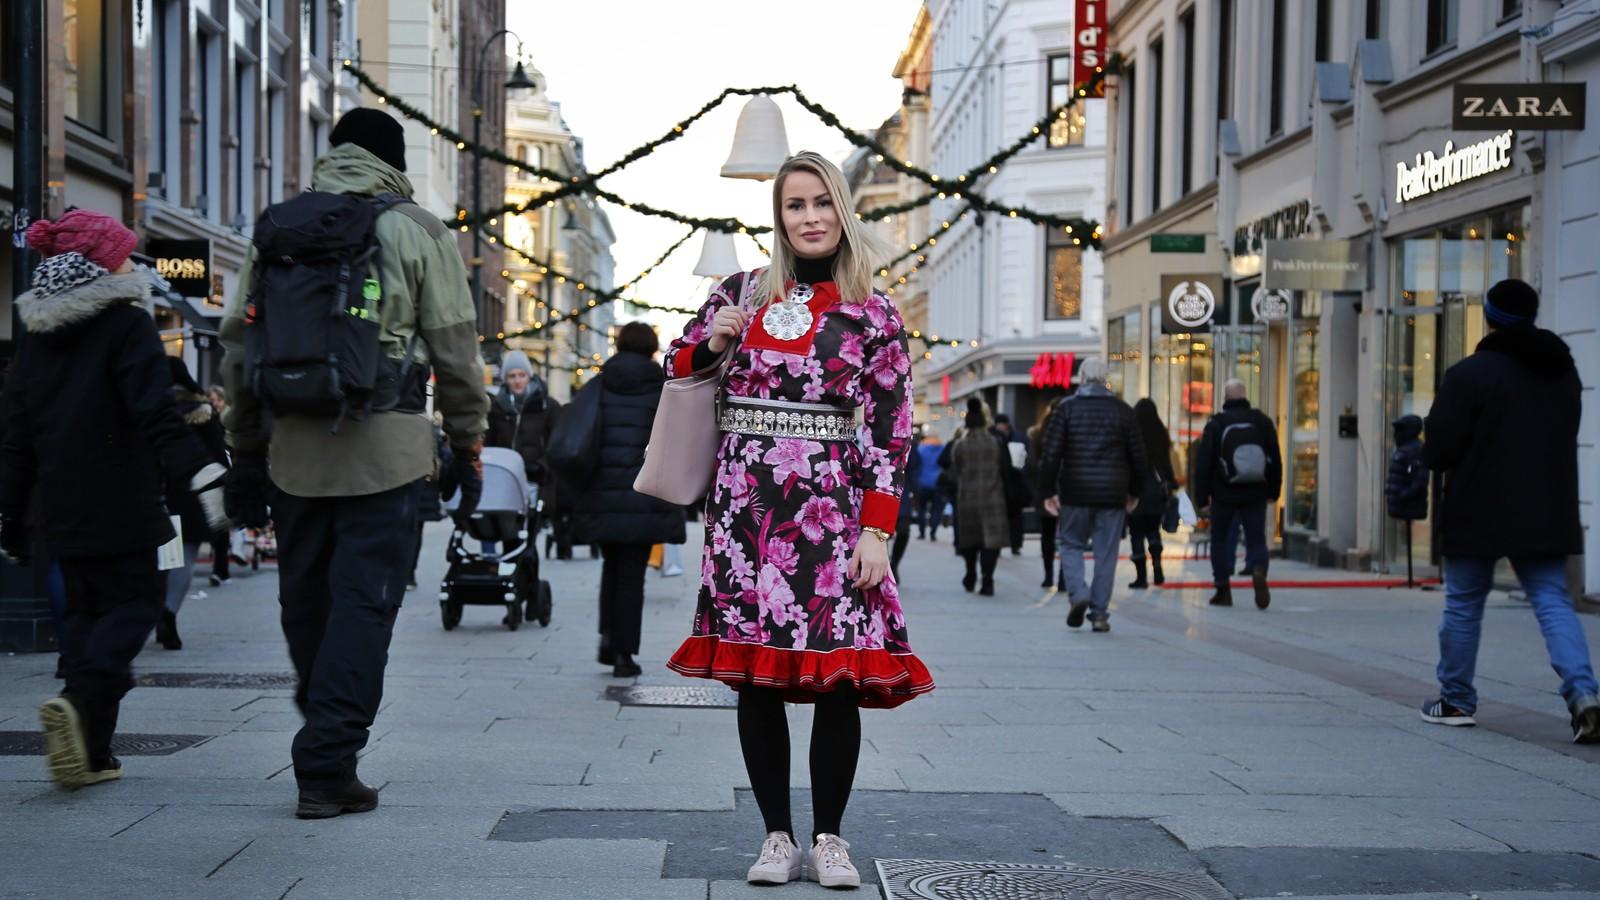 Ung kvinne i blomstrete samedrakt står midt i gata i en by. Hun har to søljer på brystet og belte med sølvknapper, rosa Micahel Kors veske over skulderen og rosa sko.